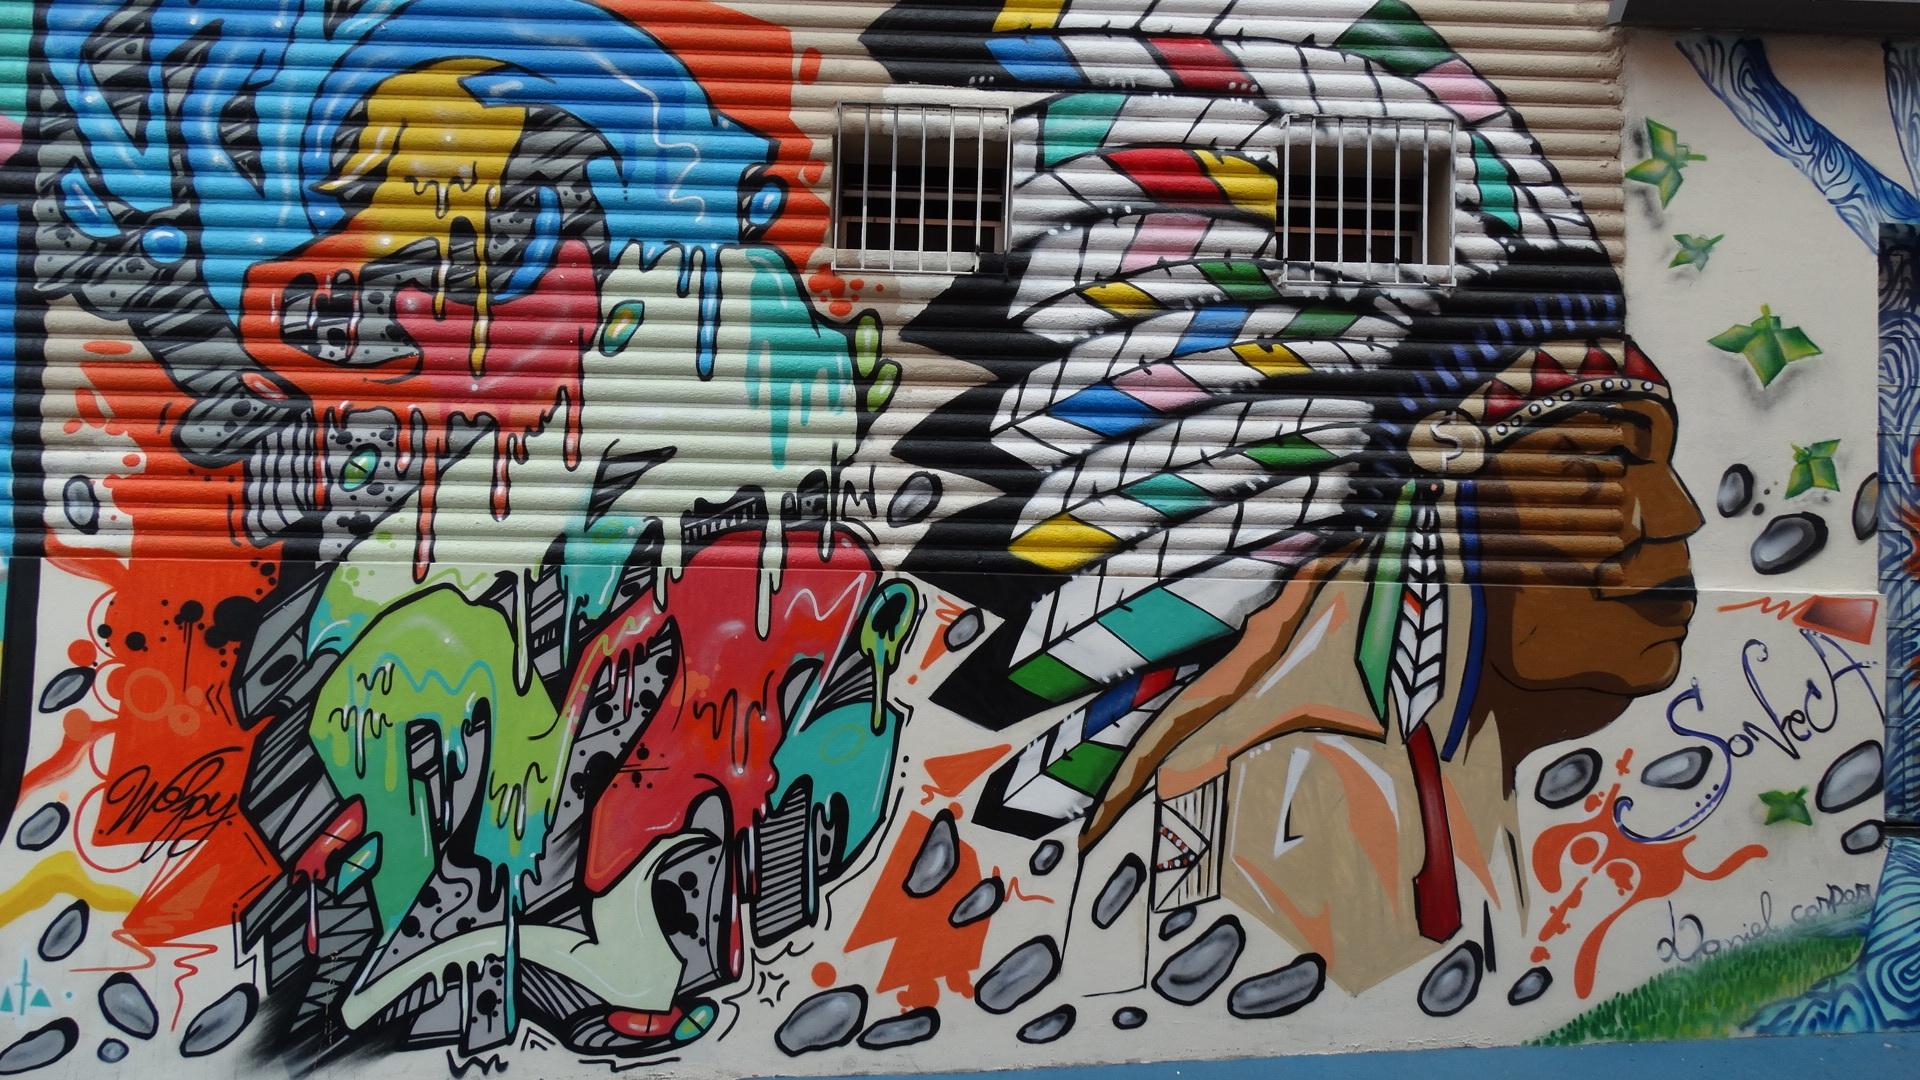 Urban graffiti painting street art art drawing mural graphite modern art